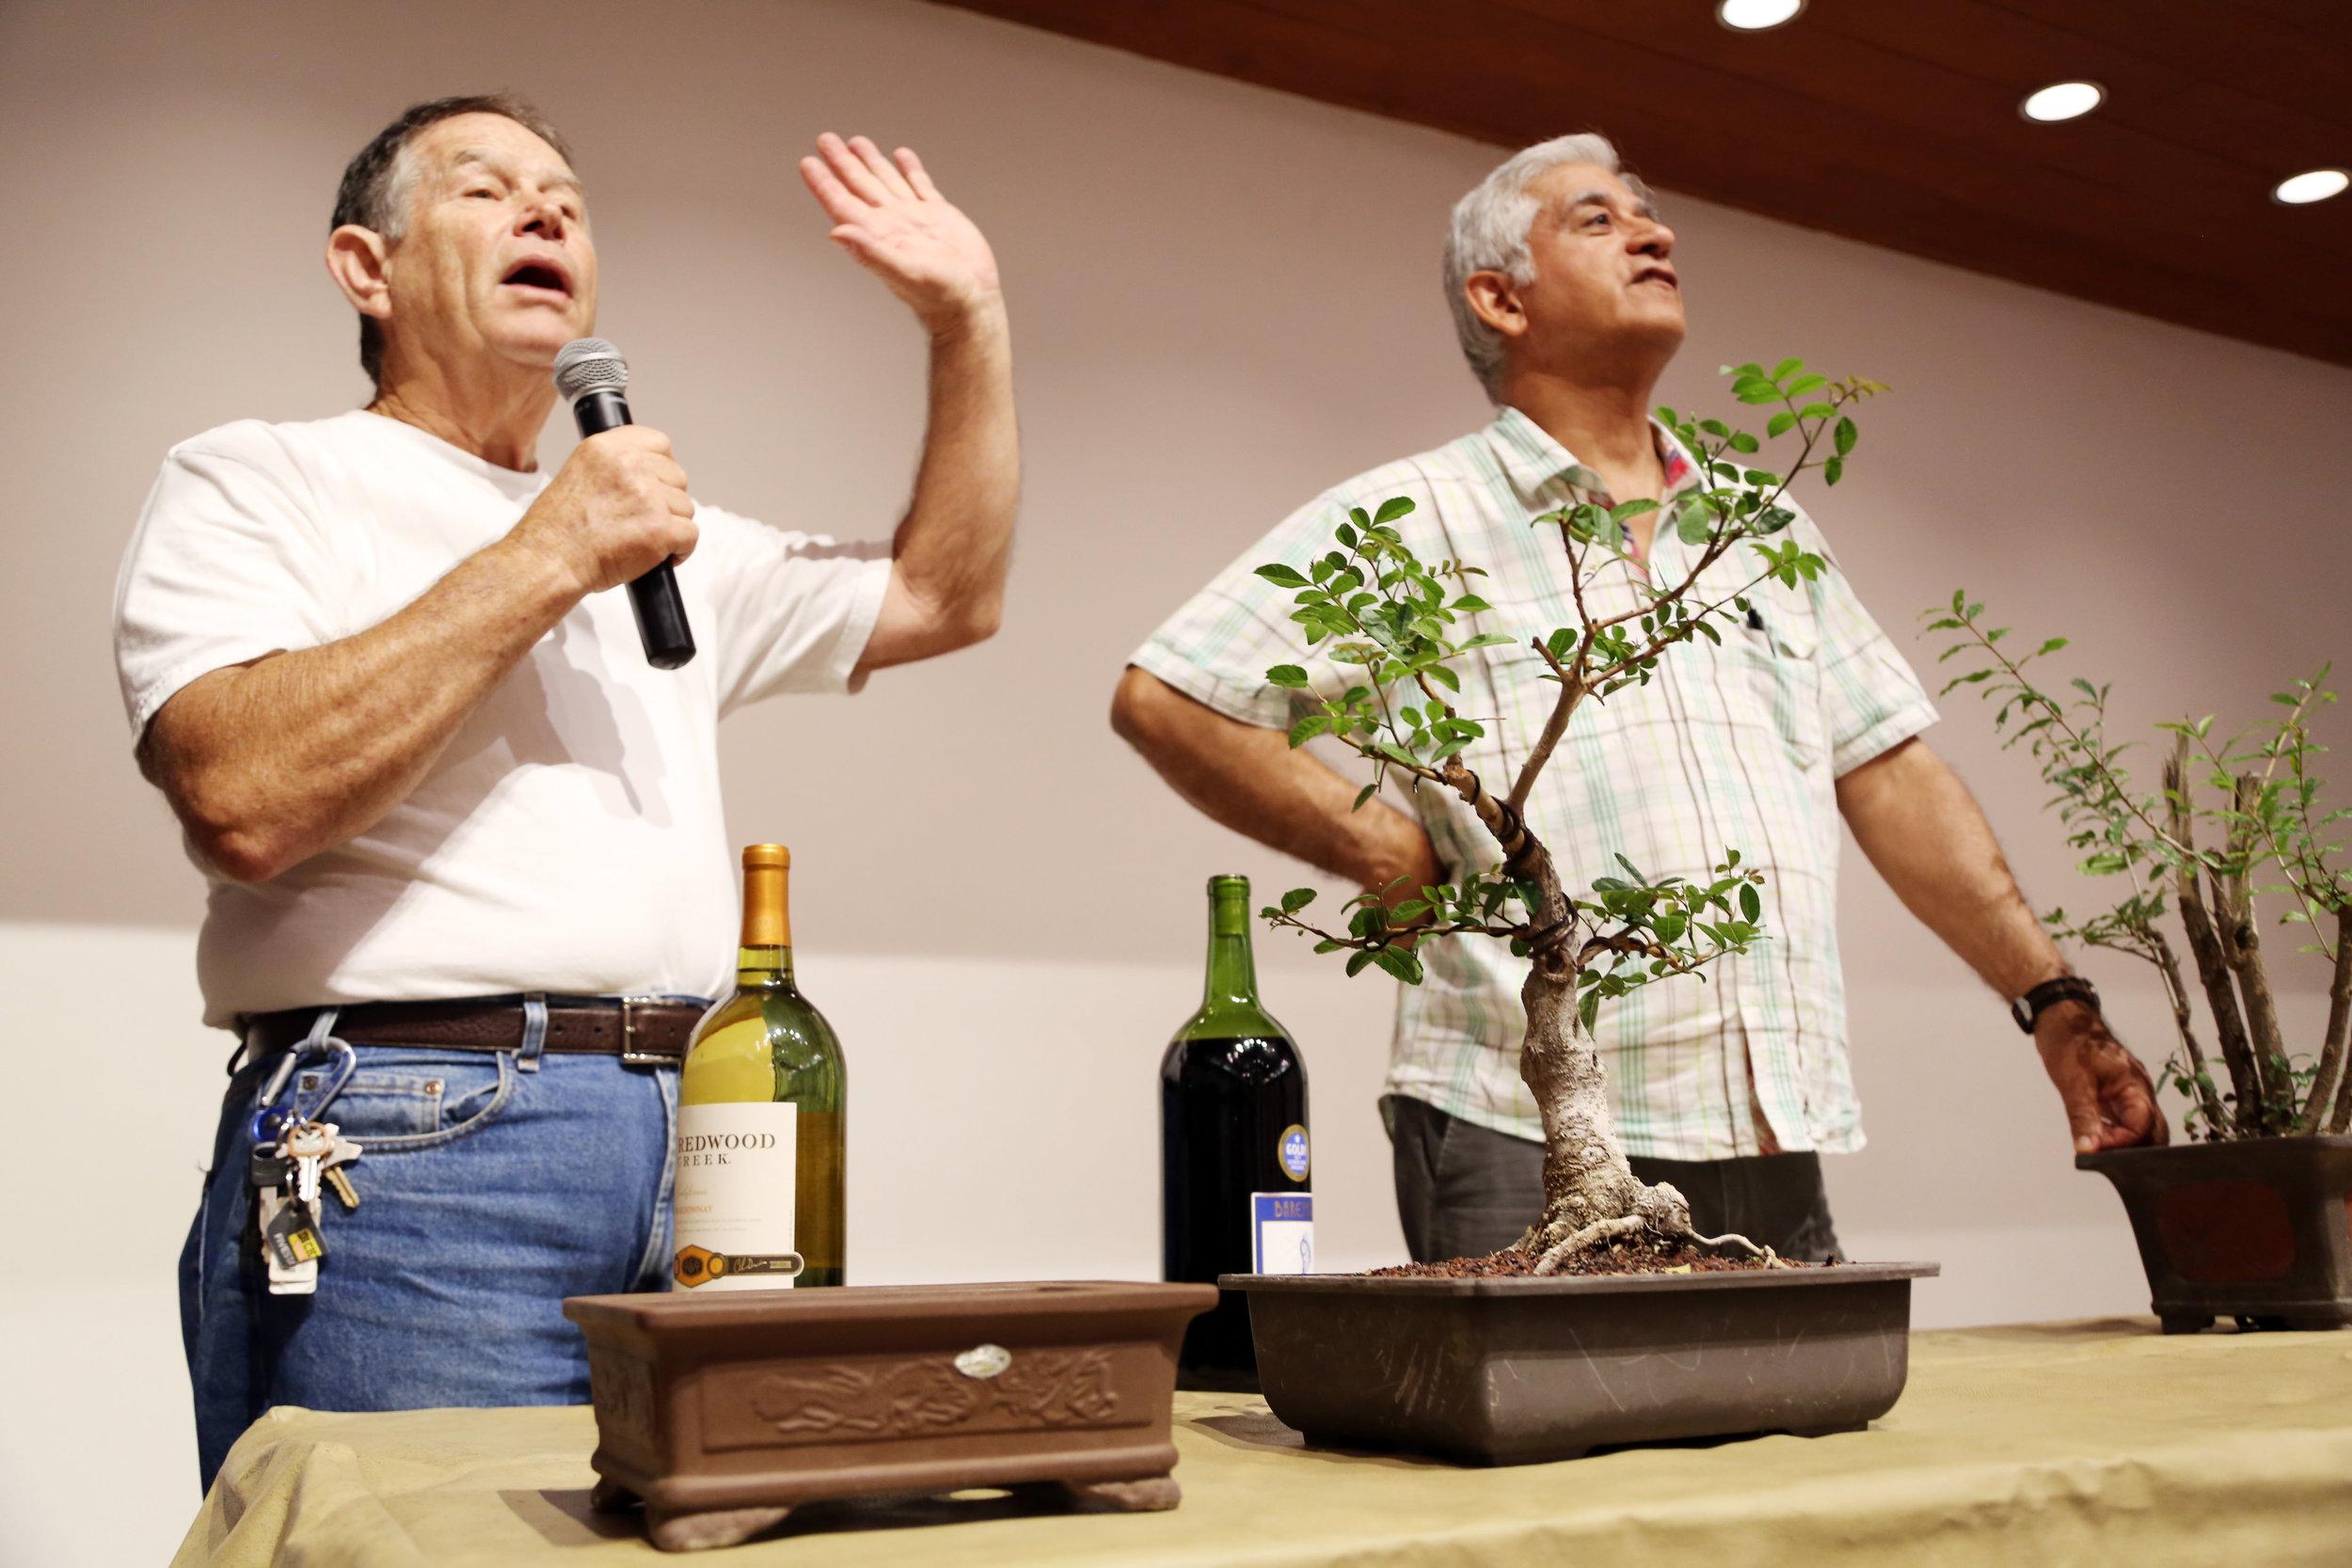 Michael-and-Cesareo-explain-the-auction-process.jpg